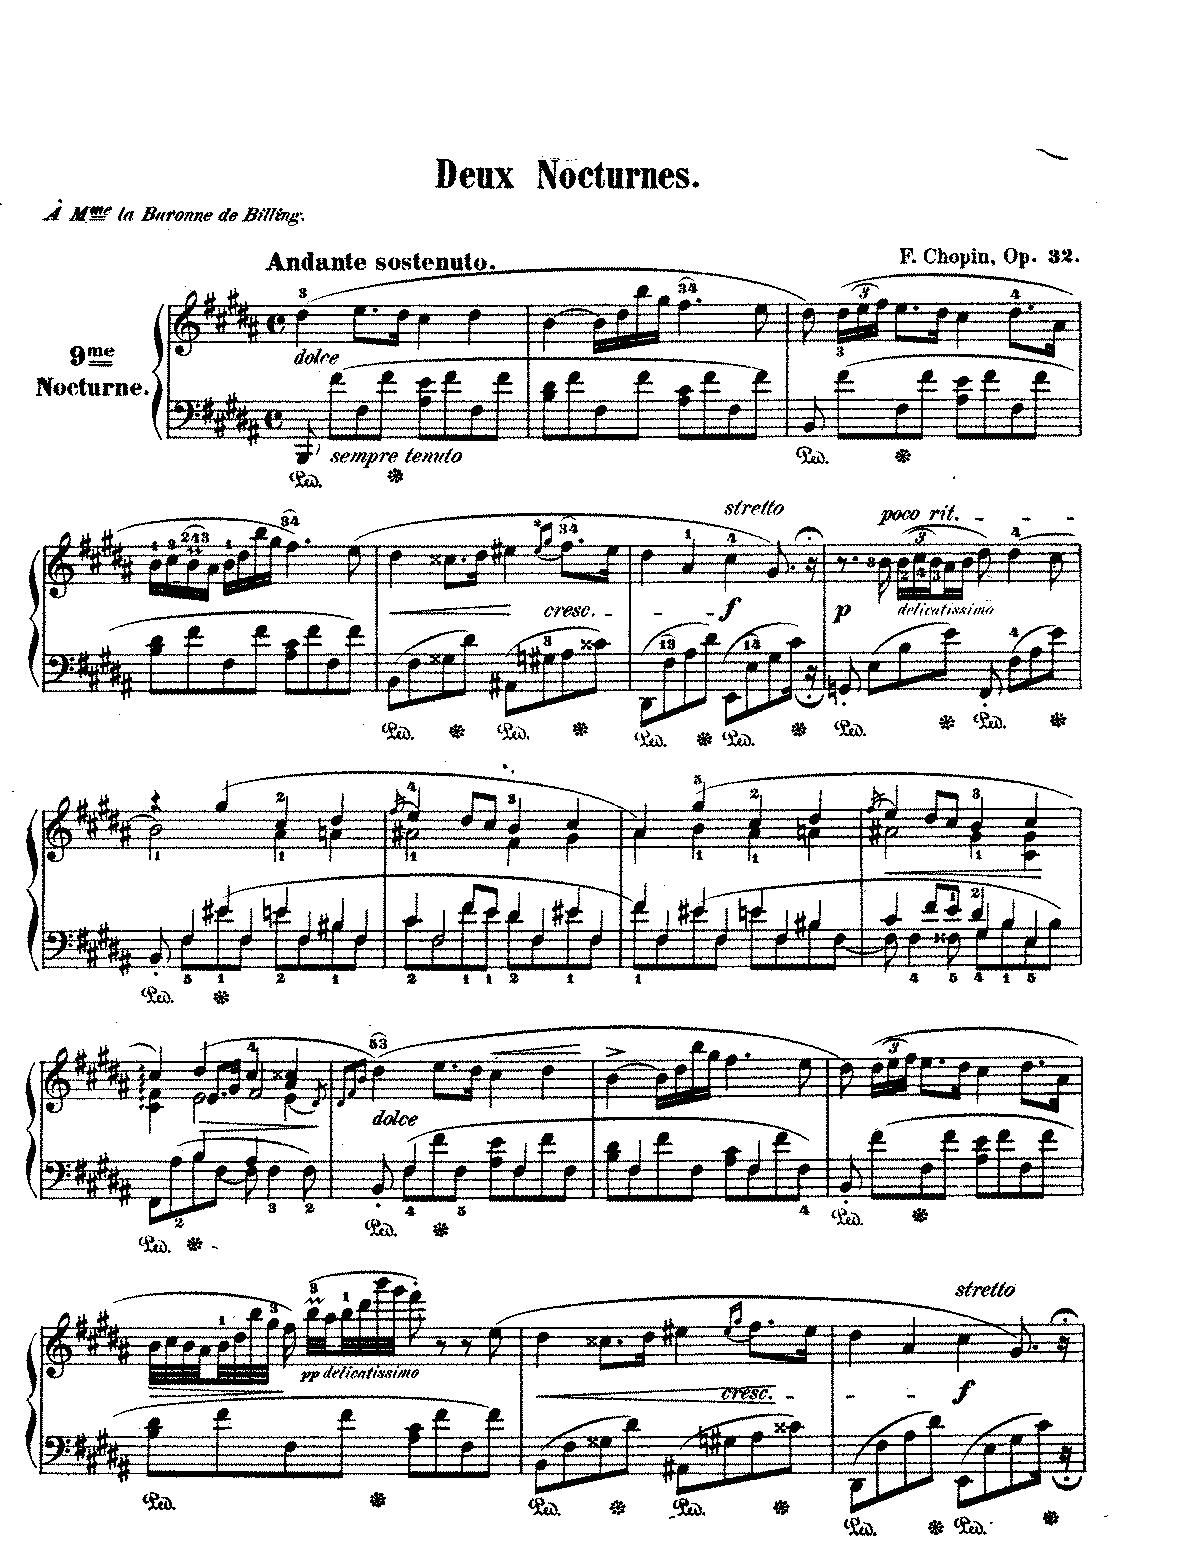 nocturne in c sharp minor violin sheet music pdf